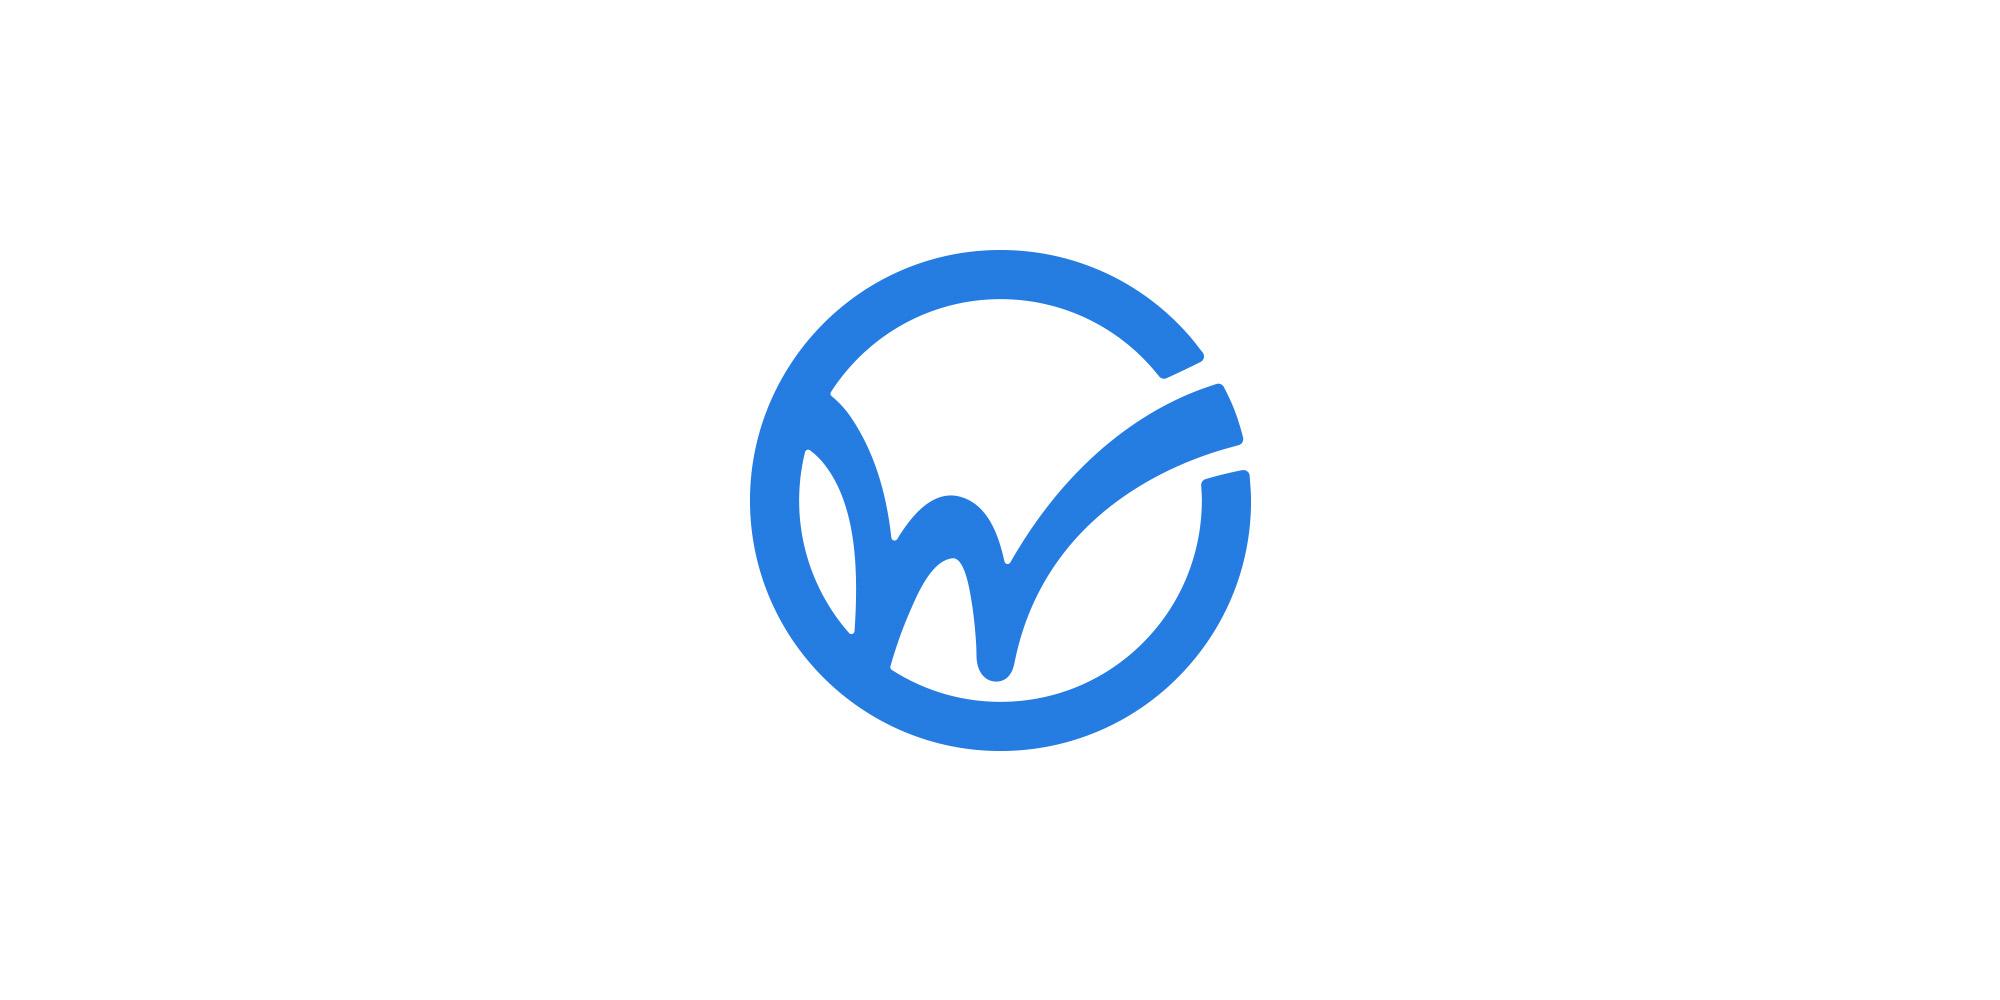 WCC0.jpg